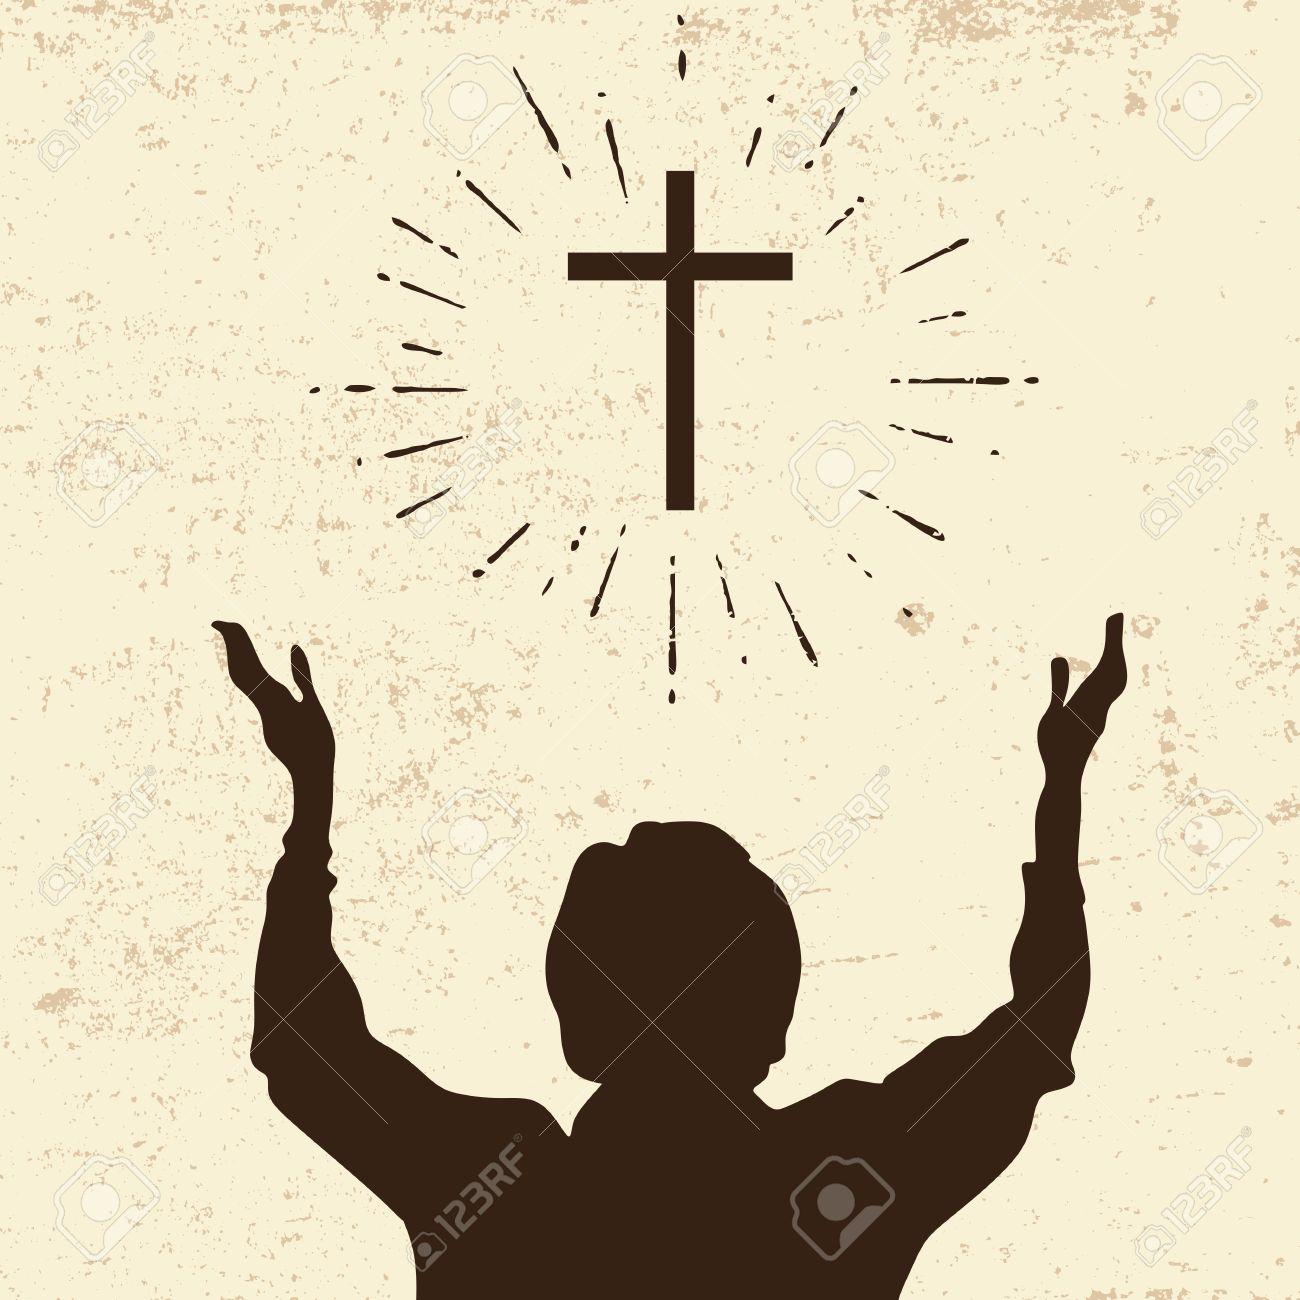 Raised hands in worship.